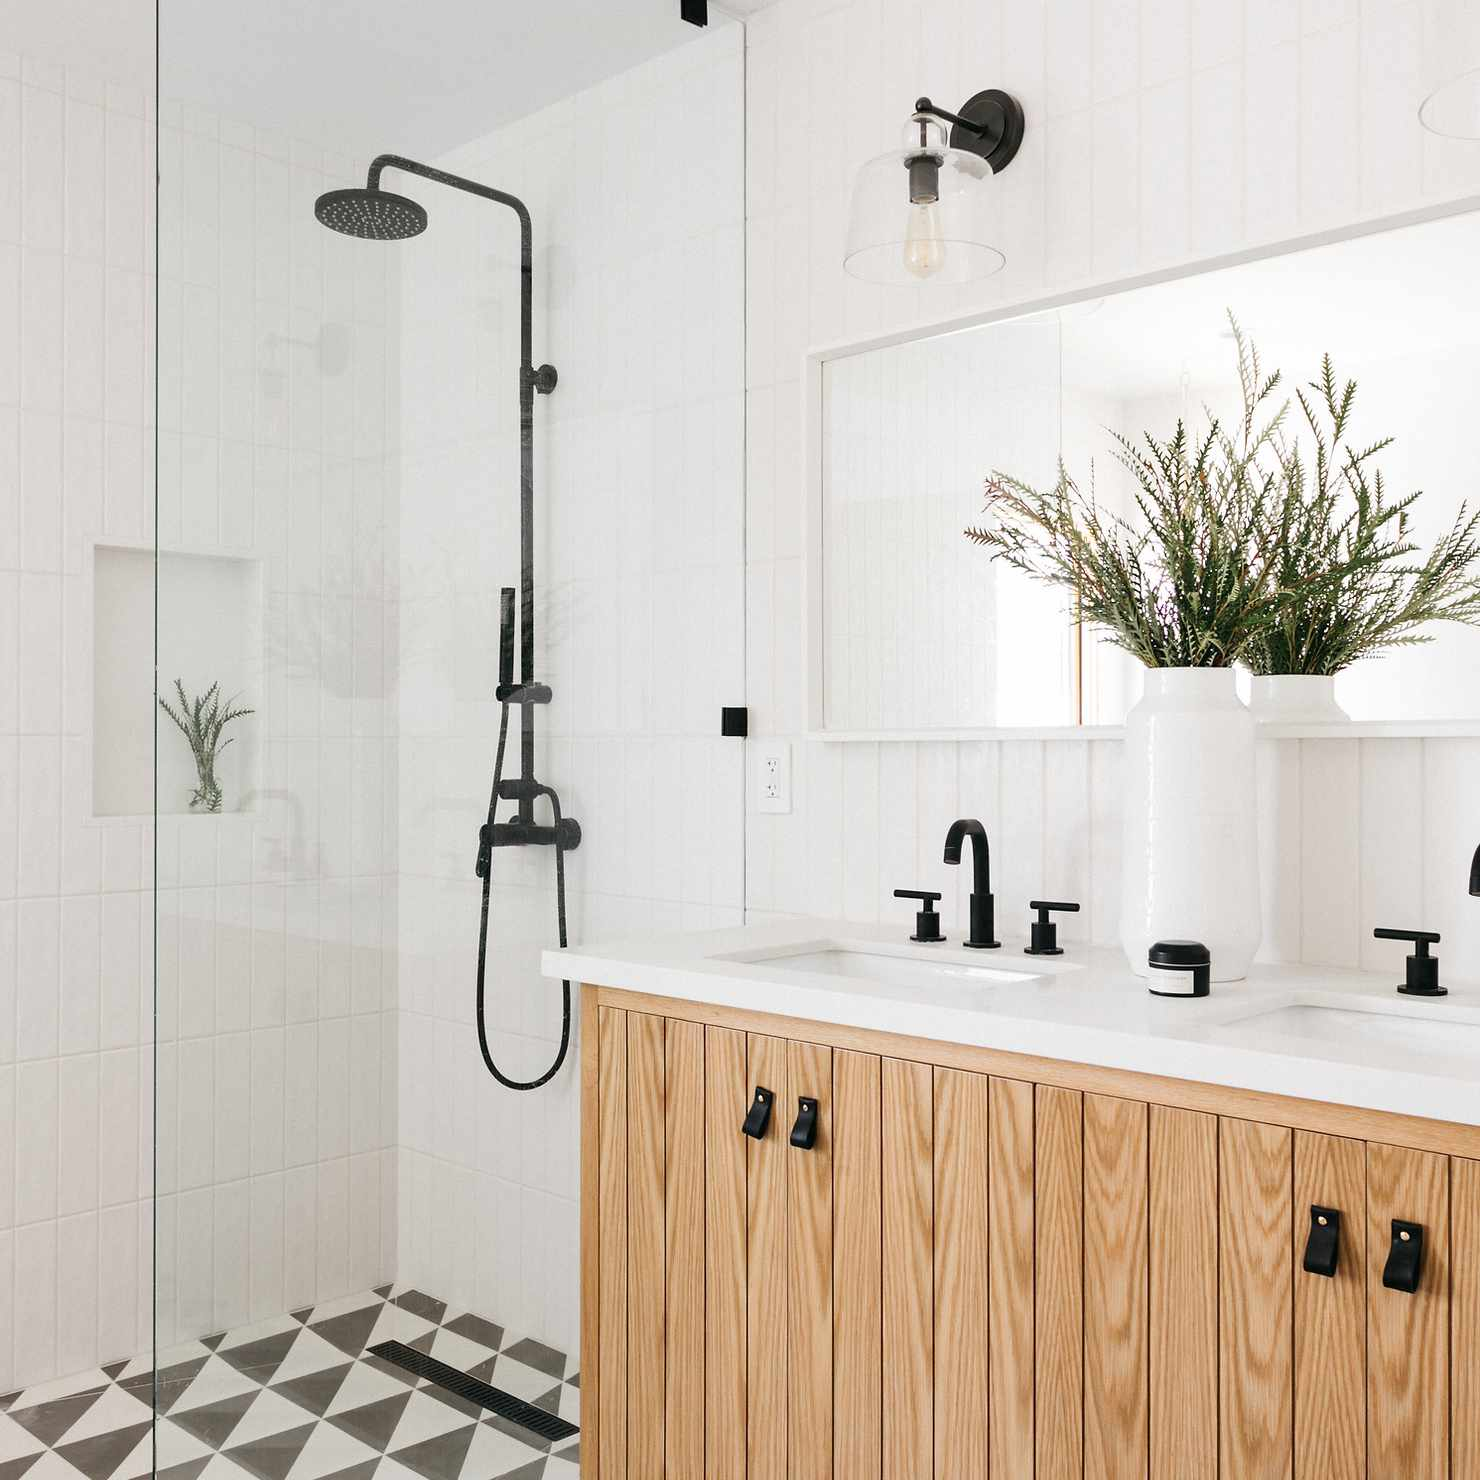 Modern bathroom with geometric tiles and wood vanity